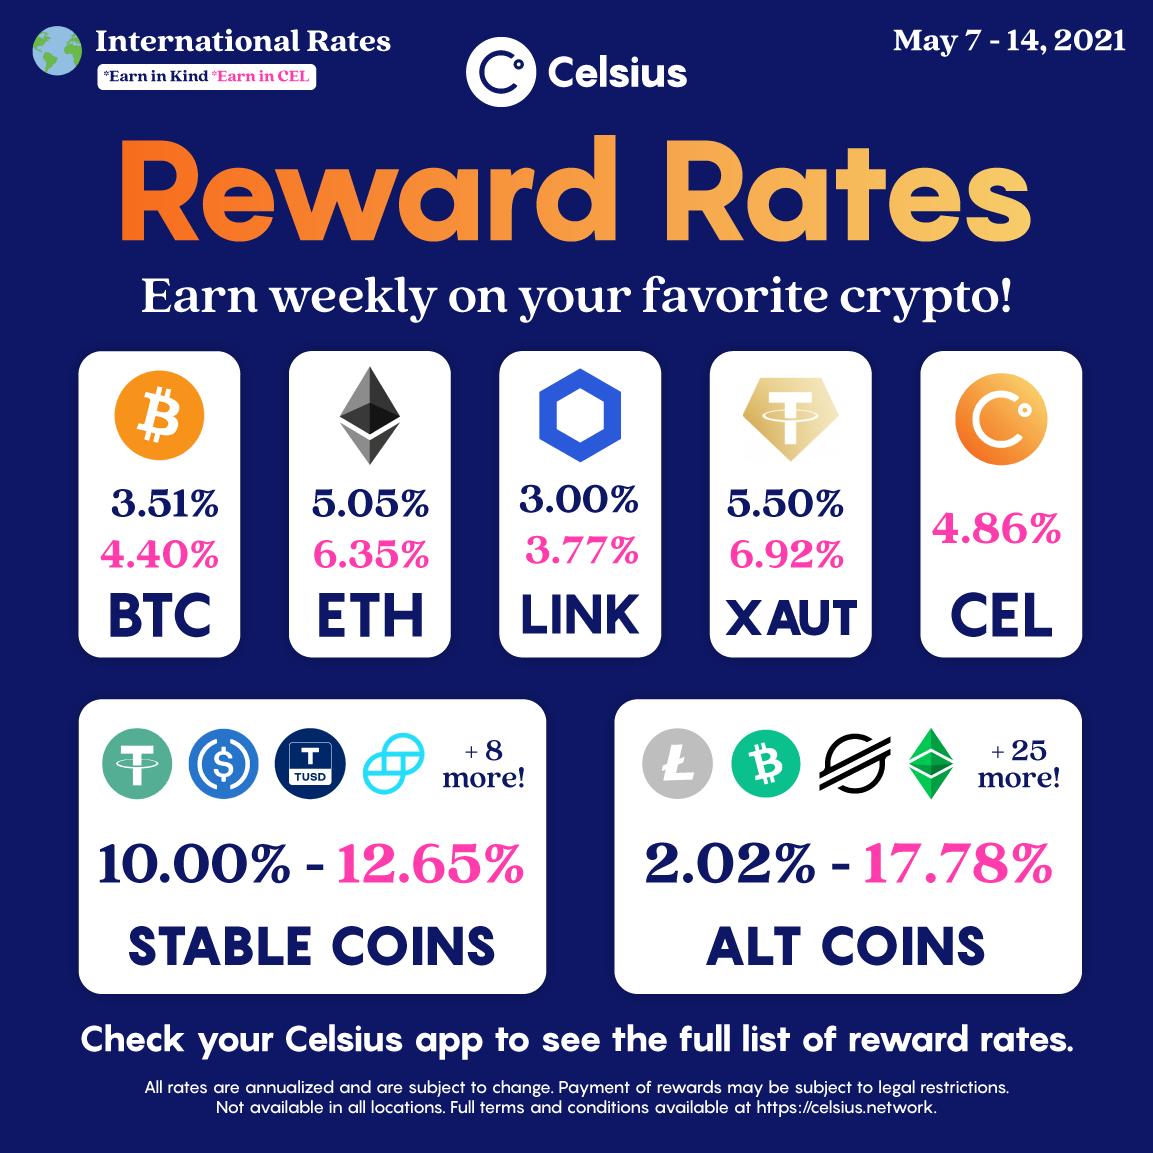 Reward Rates Int